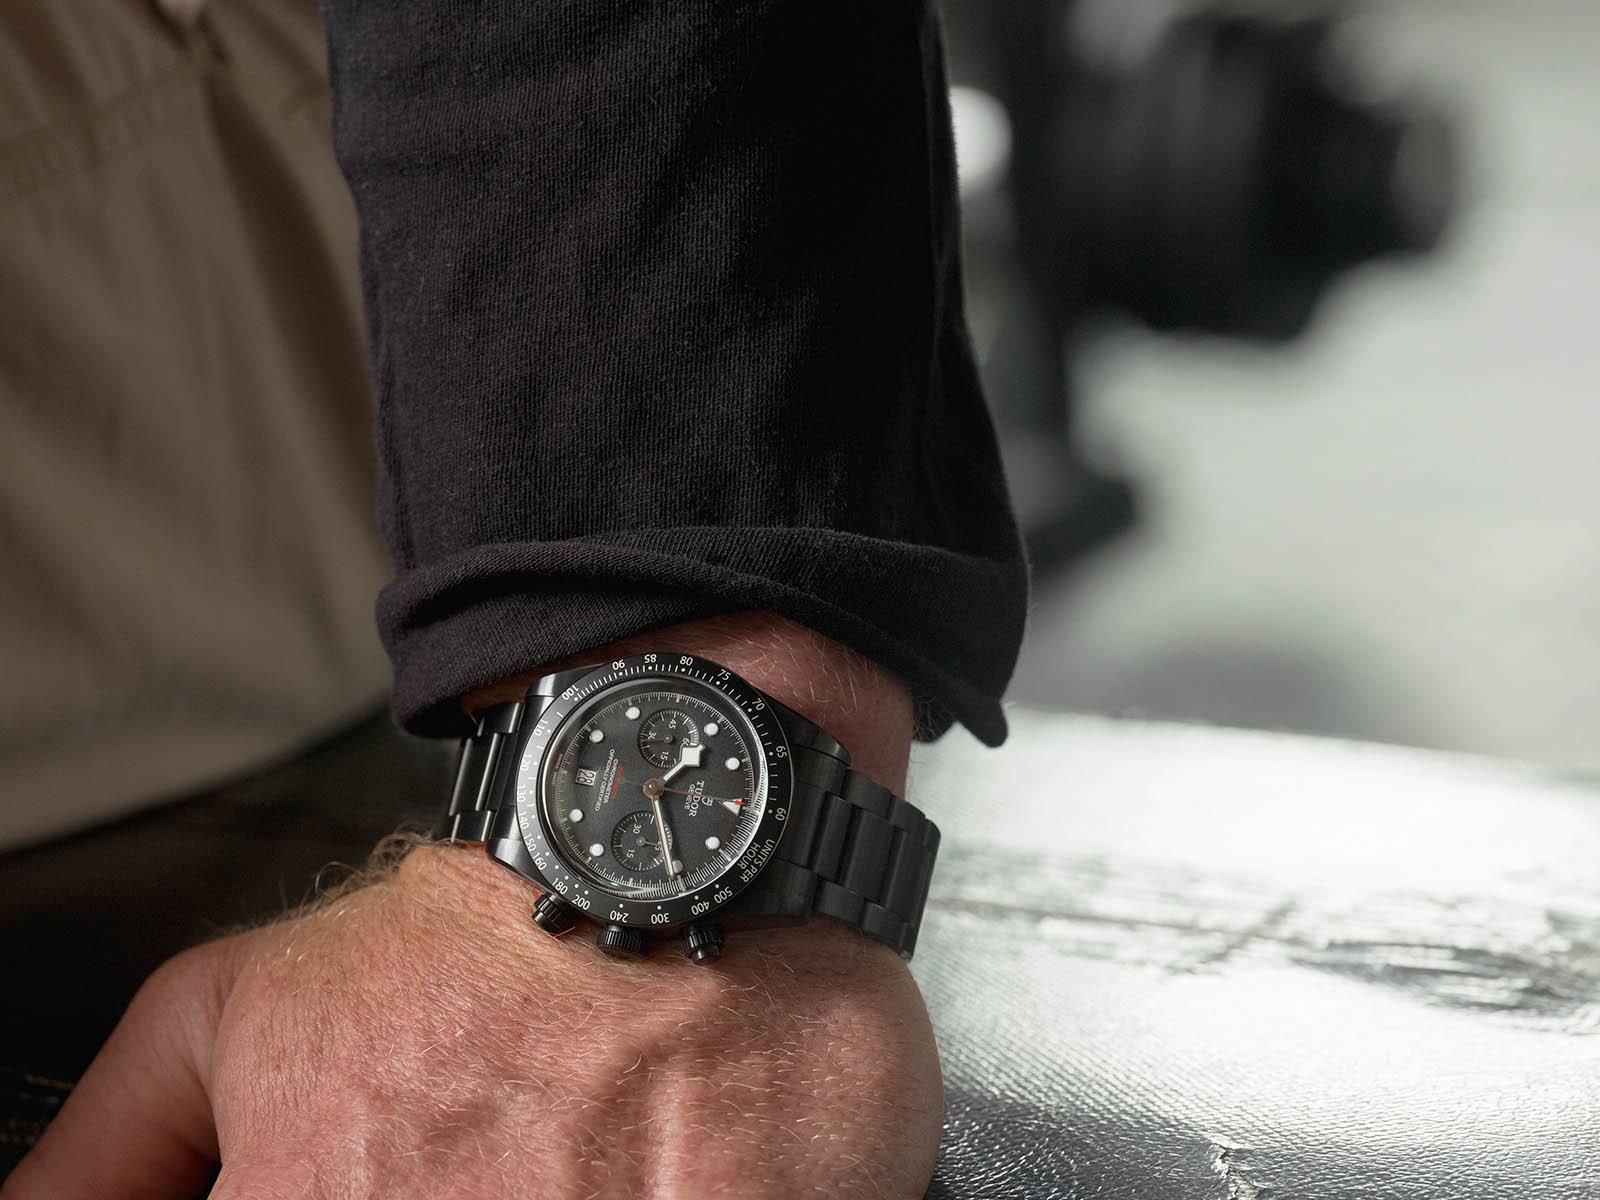 79360dk-tudor-black-bay-chrono-dark-limited-edition-6.jpg